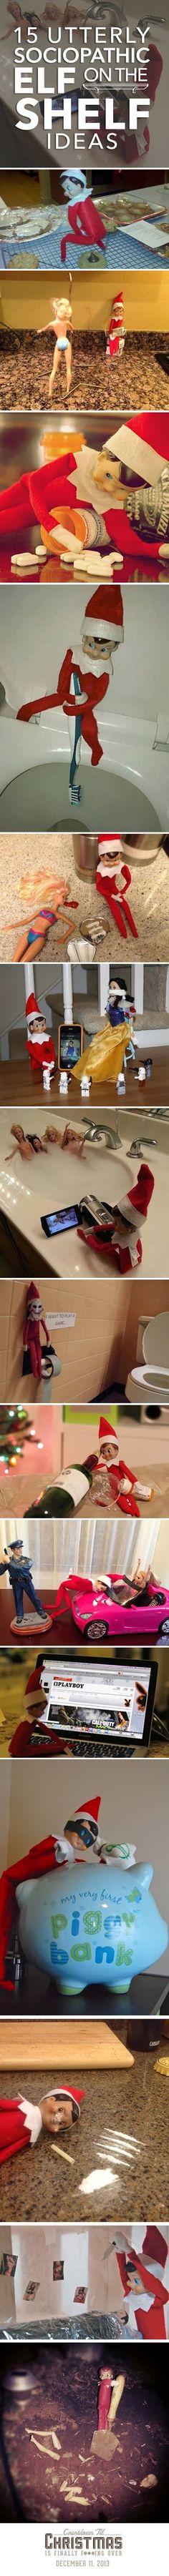 We Ahead: Elf on the shelf